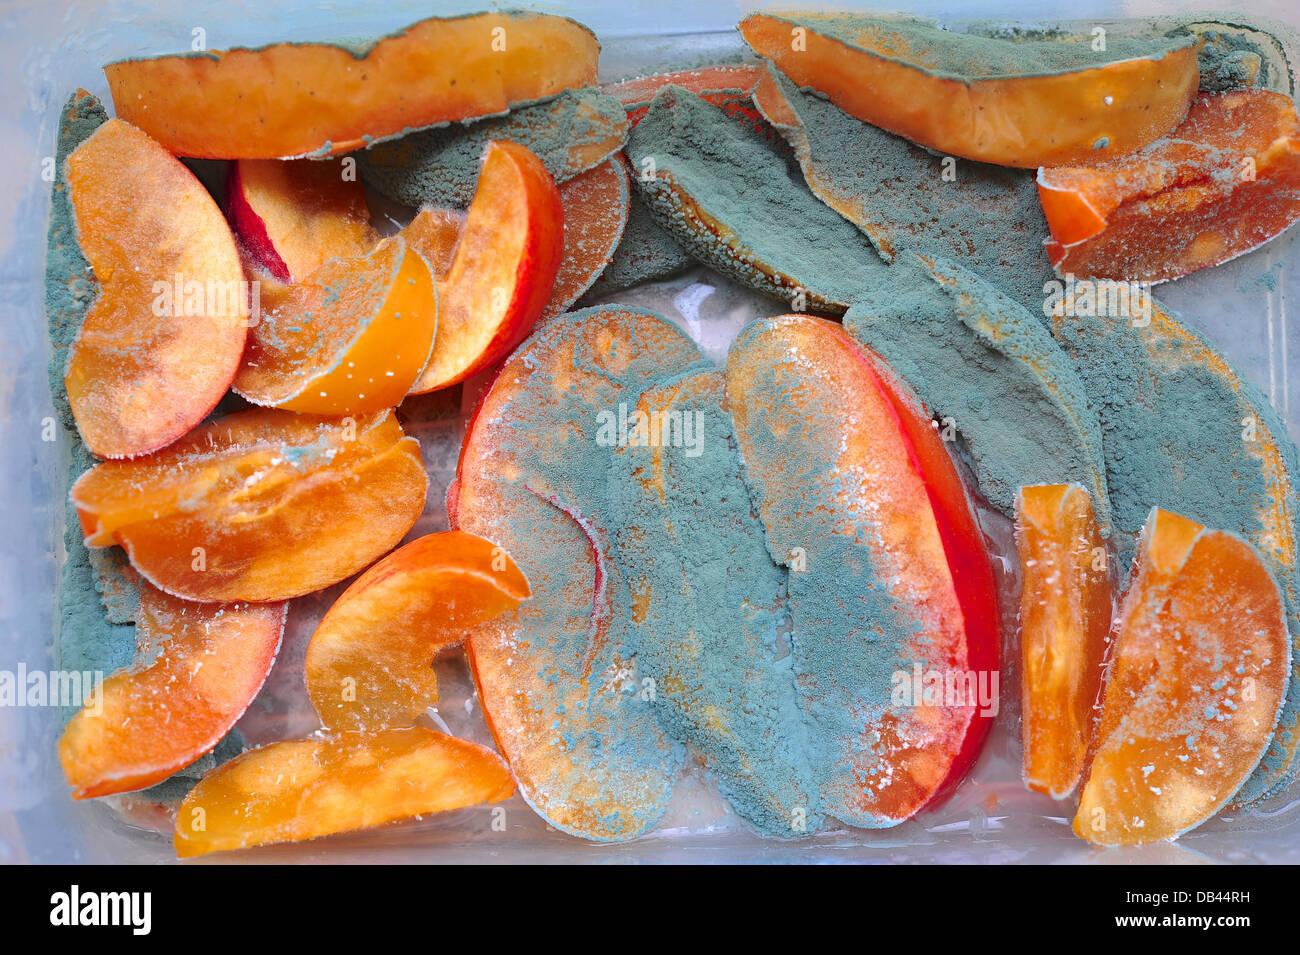 Fungi in fruit - Stock Image